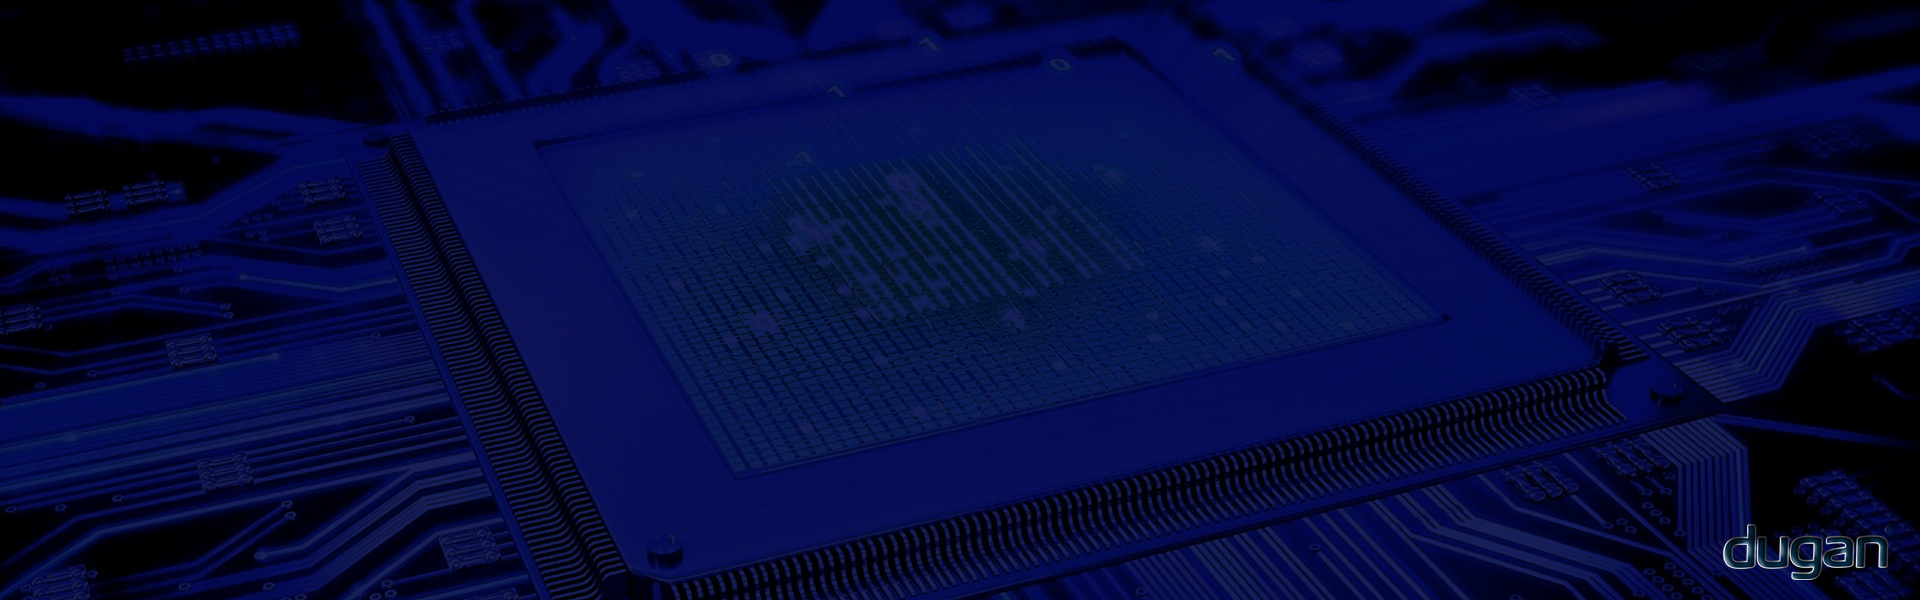 dugan_bilgisayar